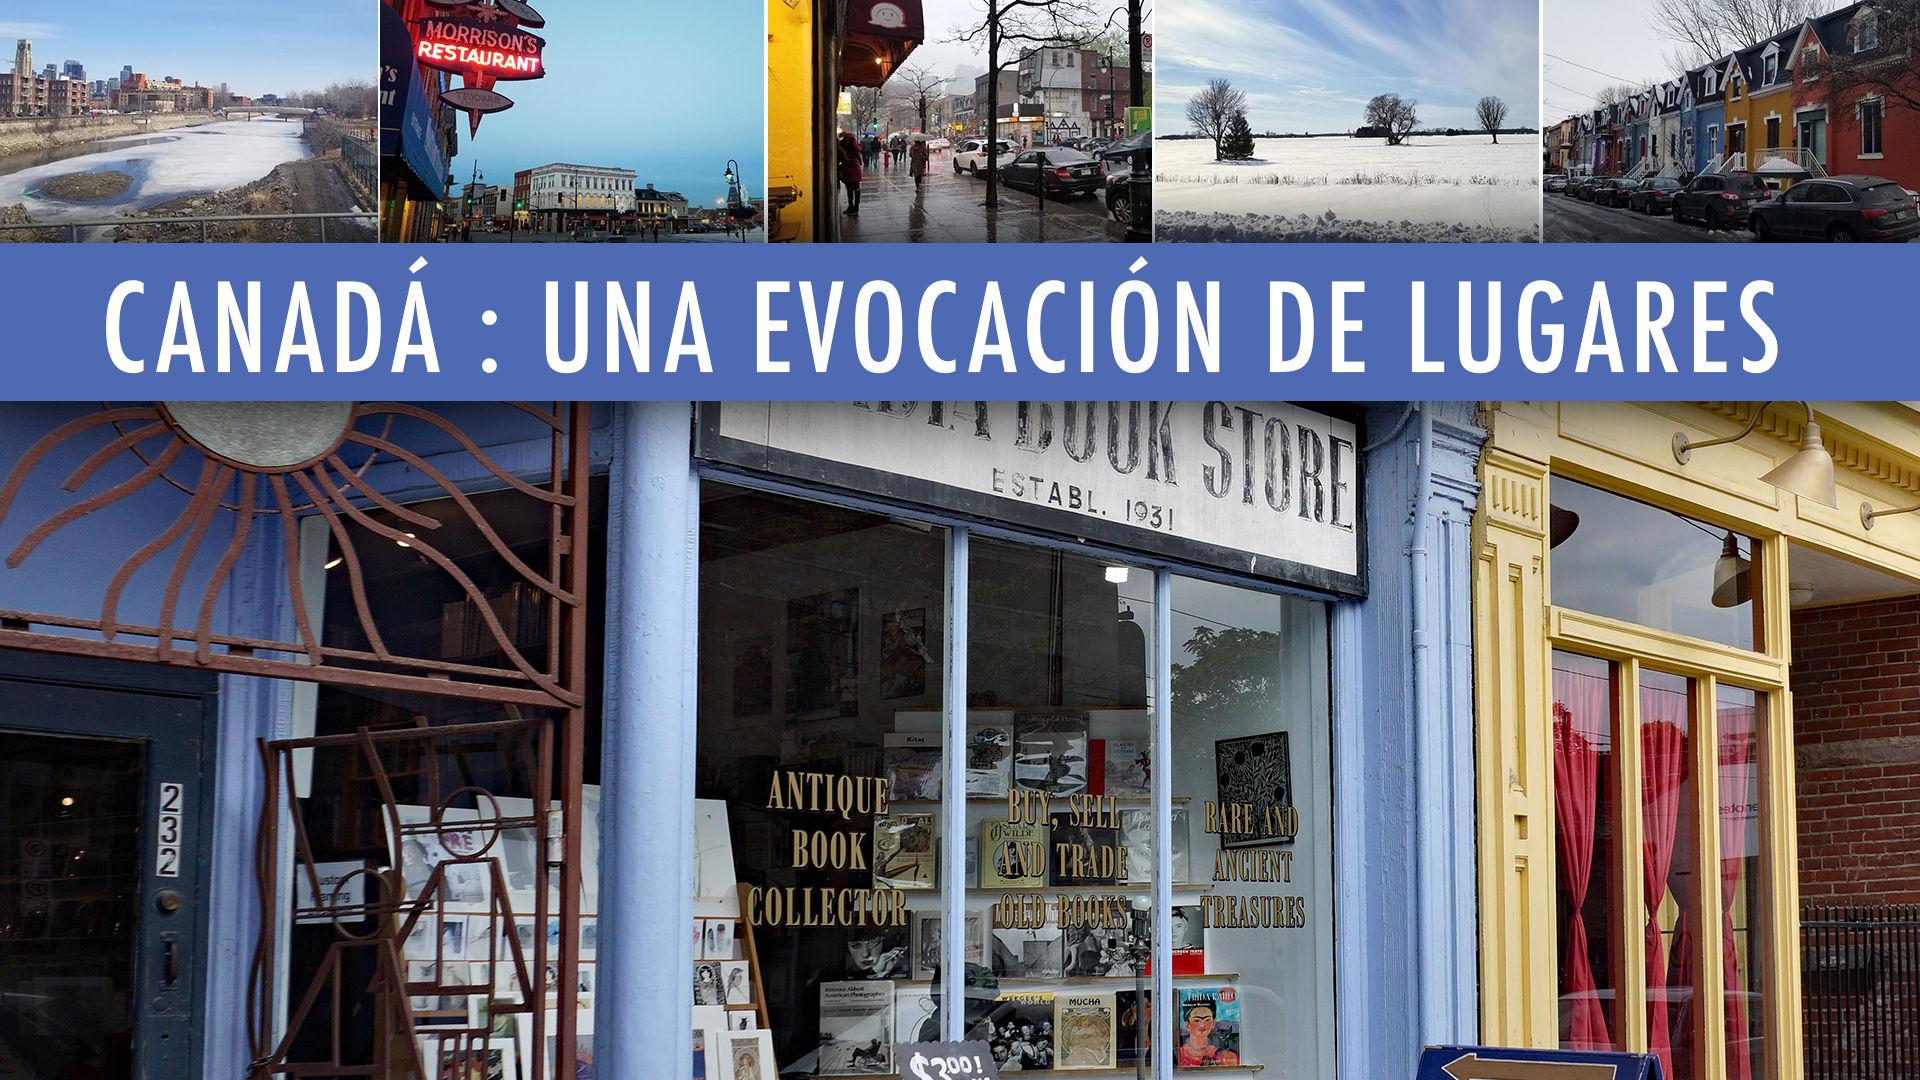 le texte «Canadá: Una evocación de lugares» accompagné de photographies de divers lieux du Canada